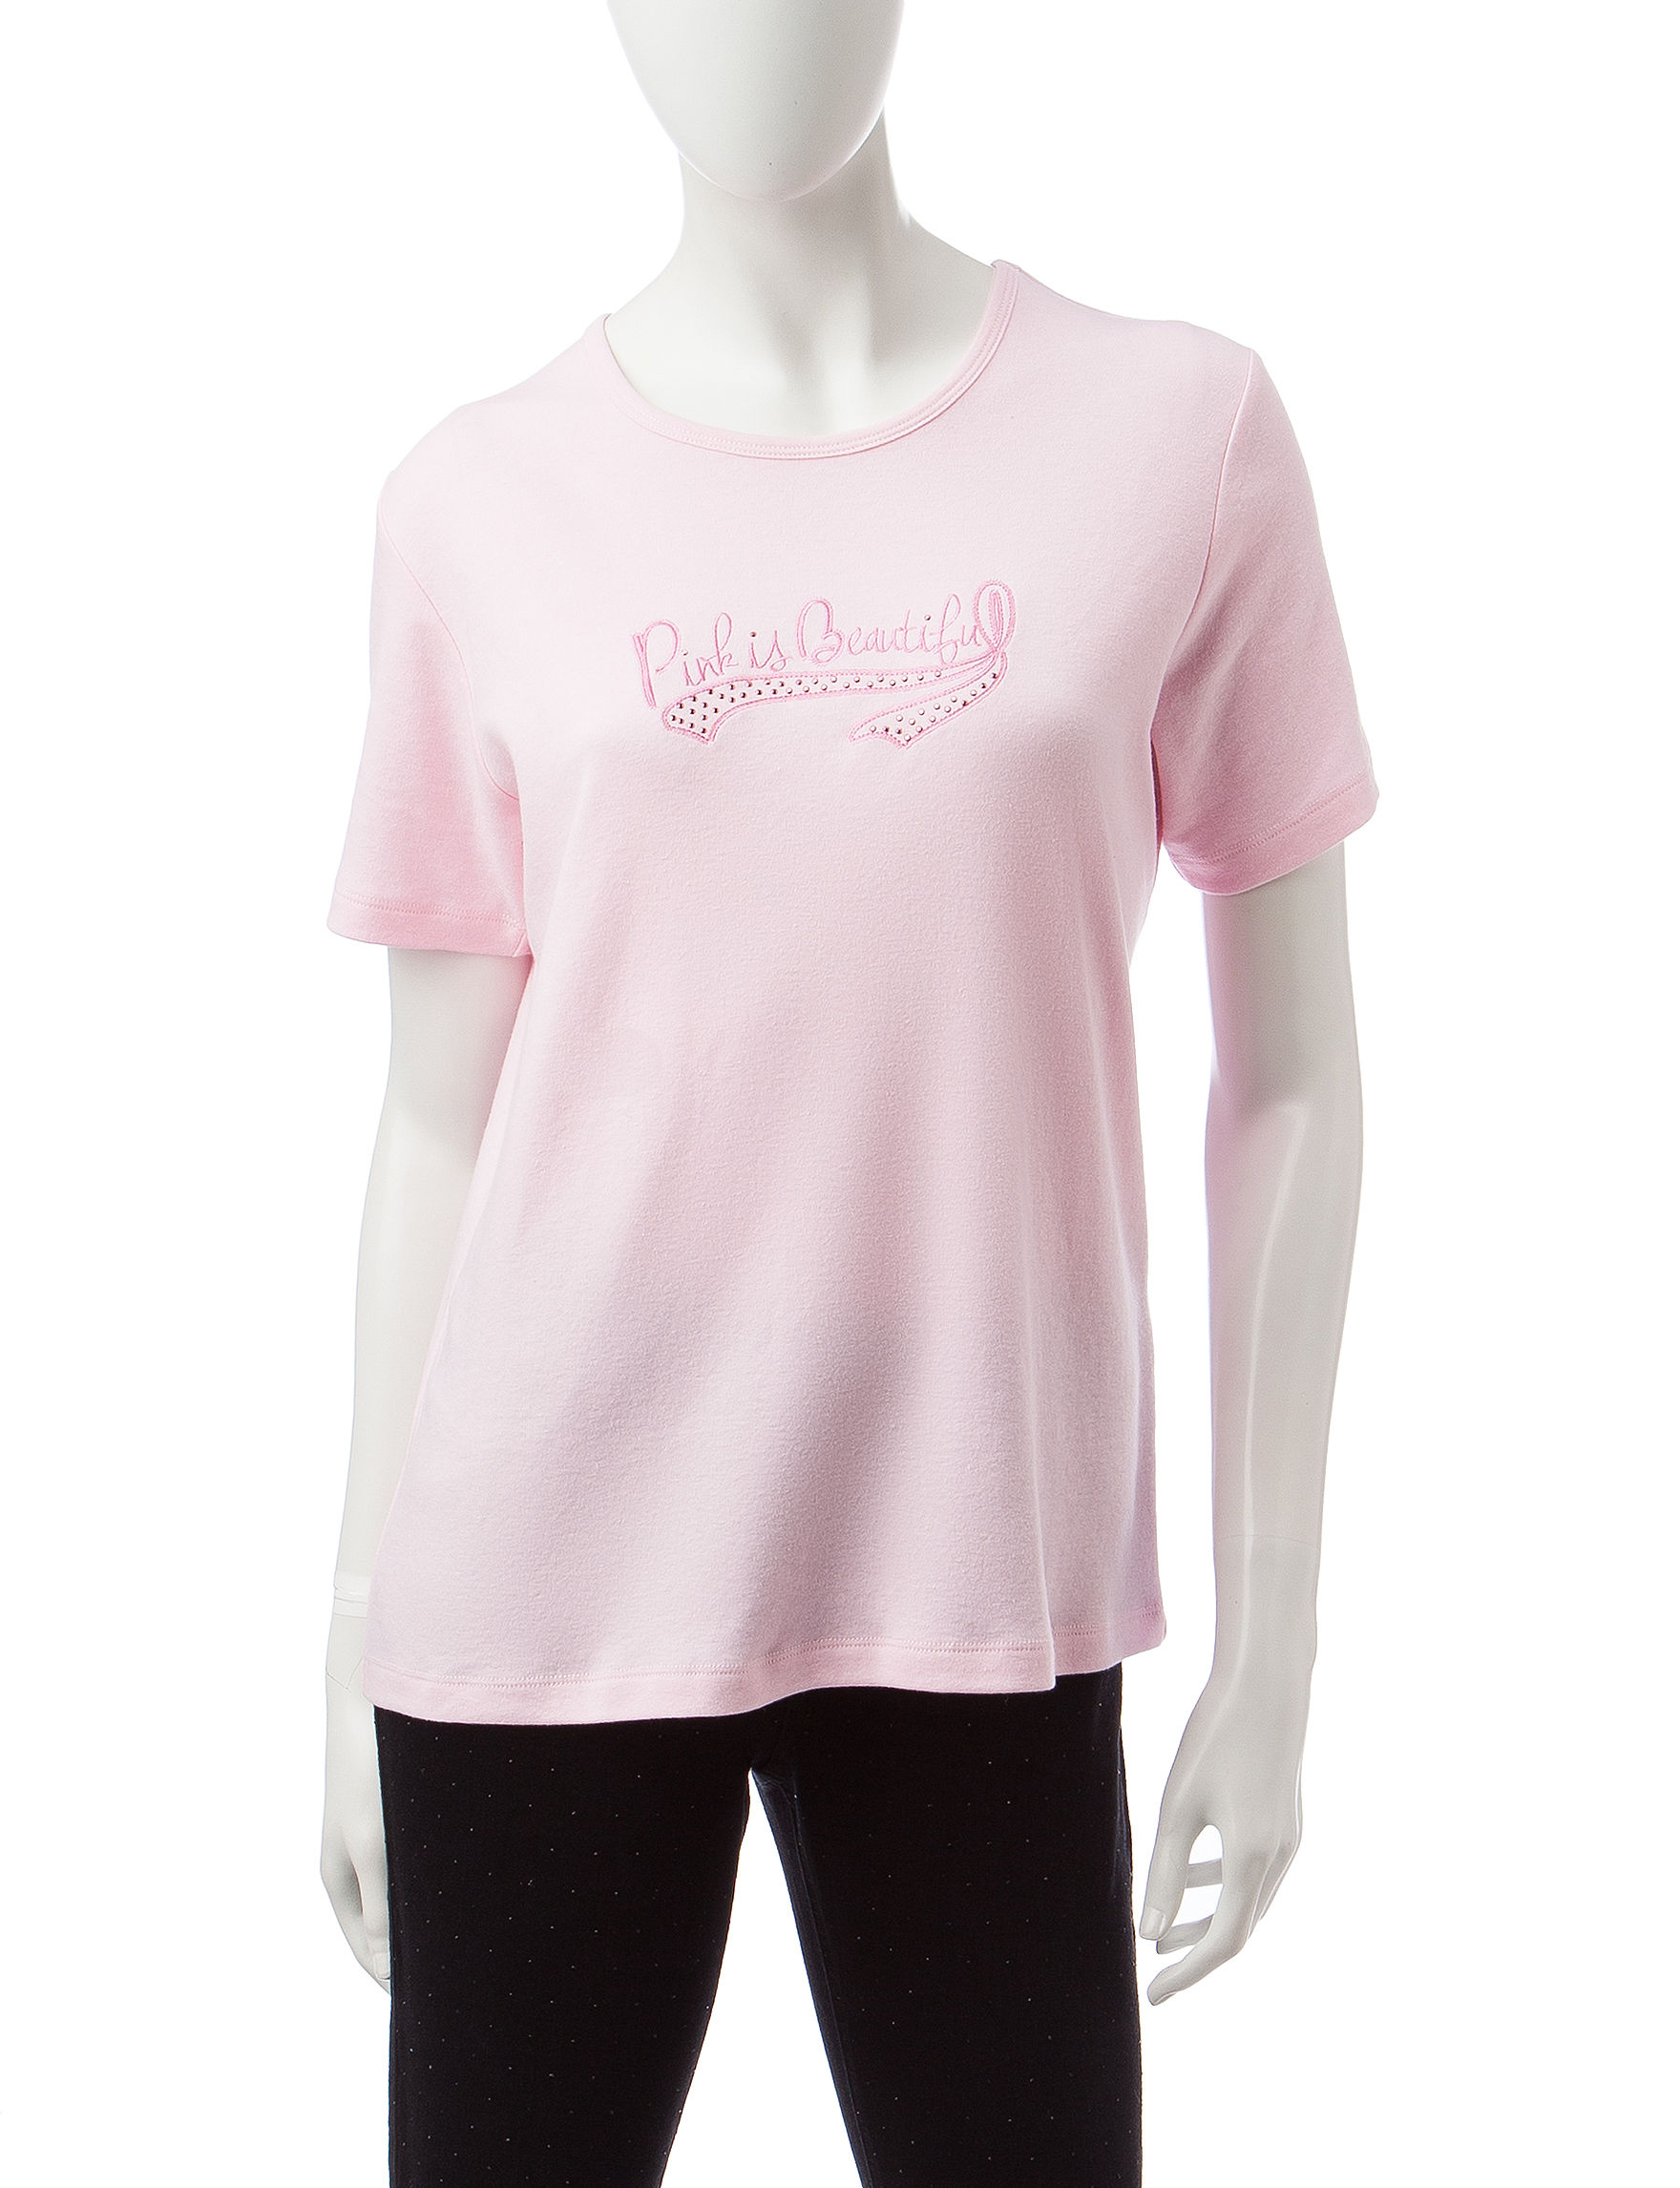 MCcc Sportswear Pink Shirts & Blouses